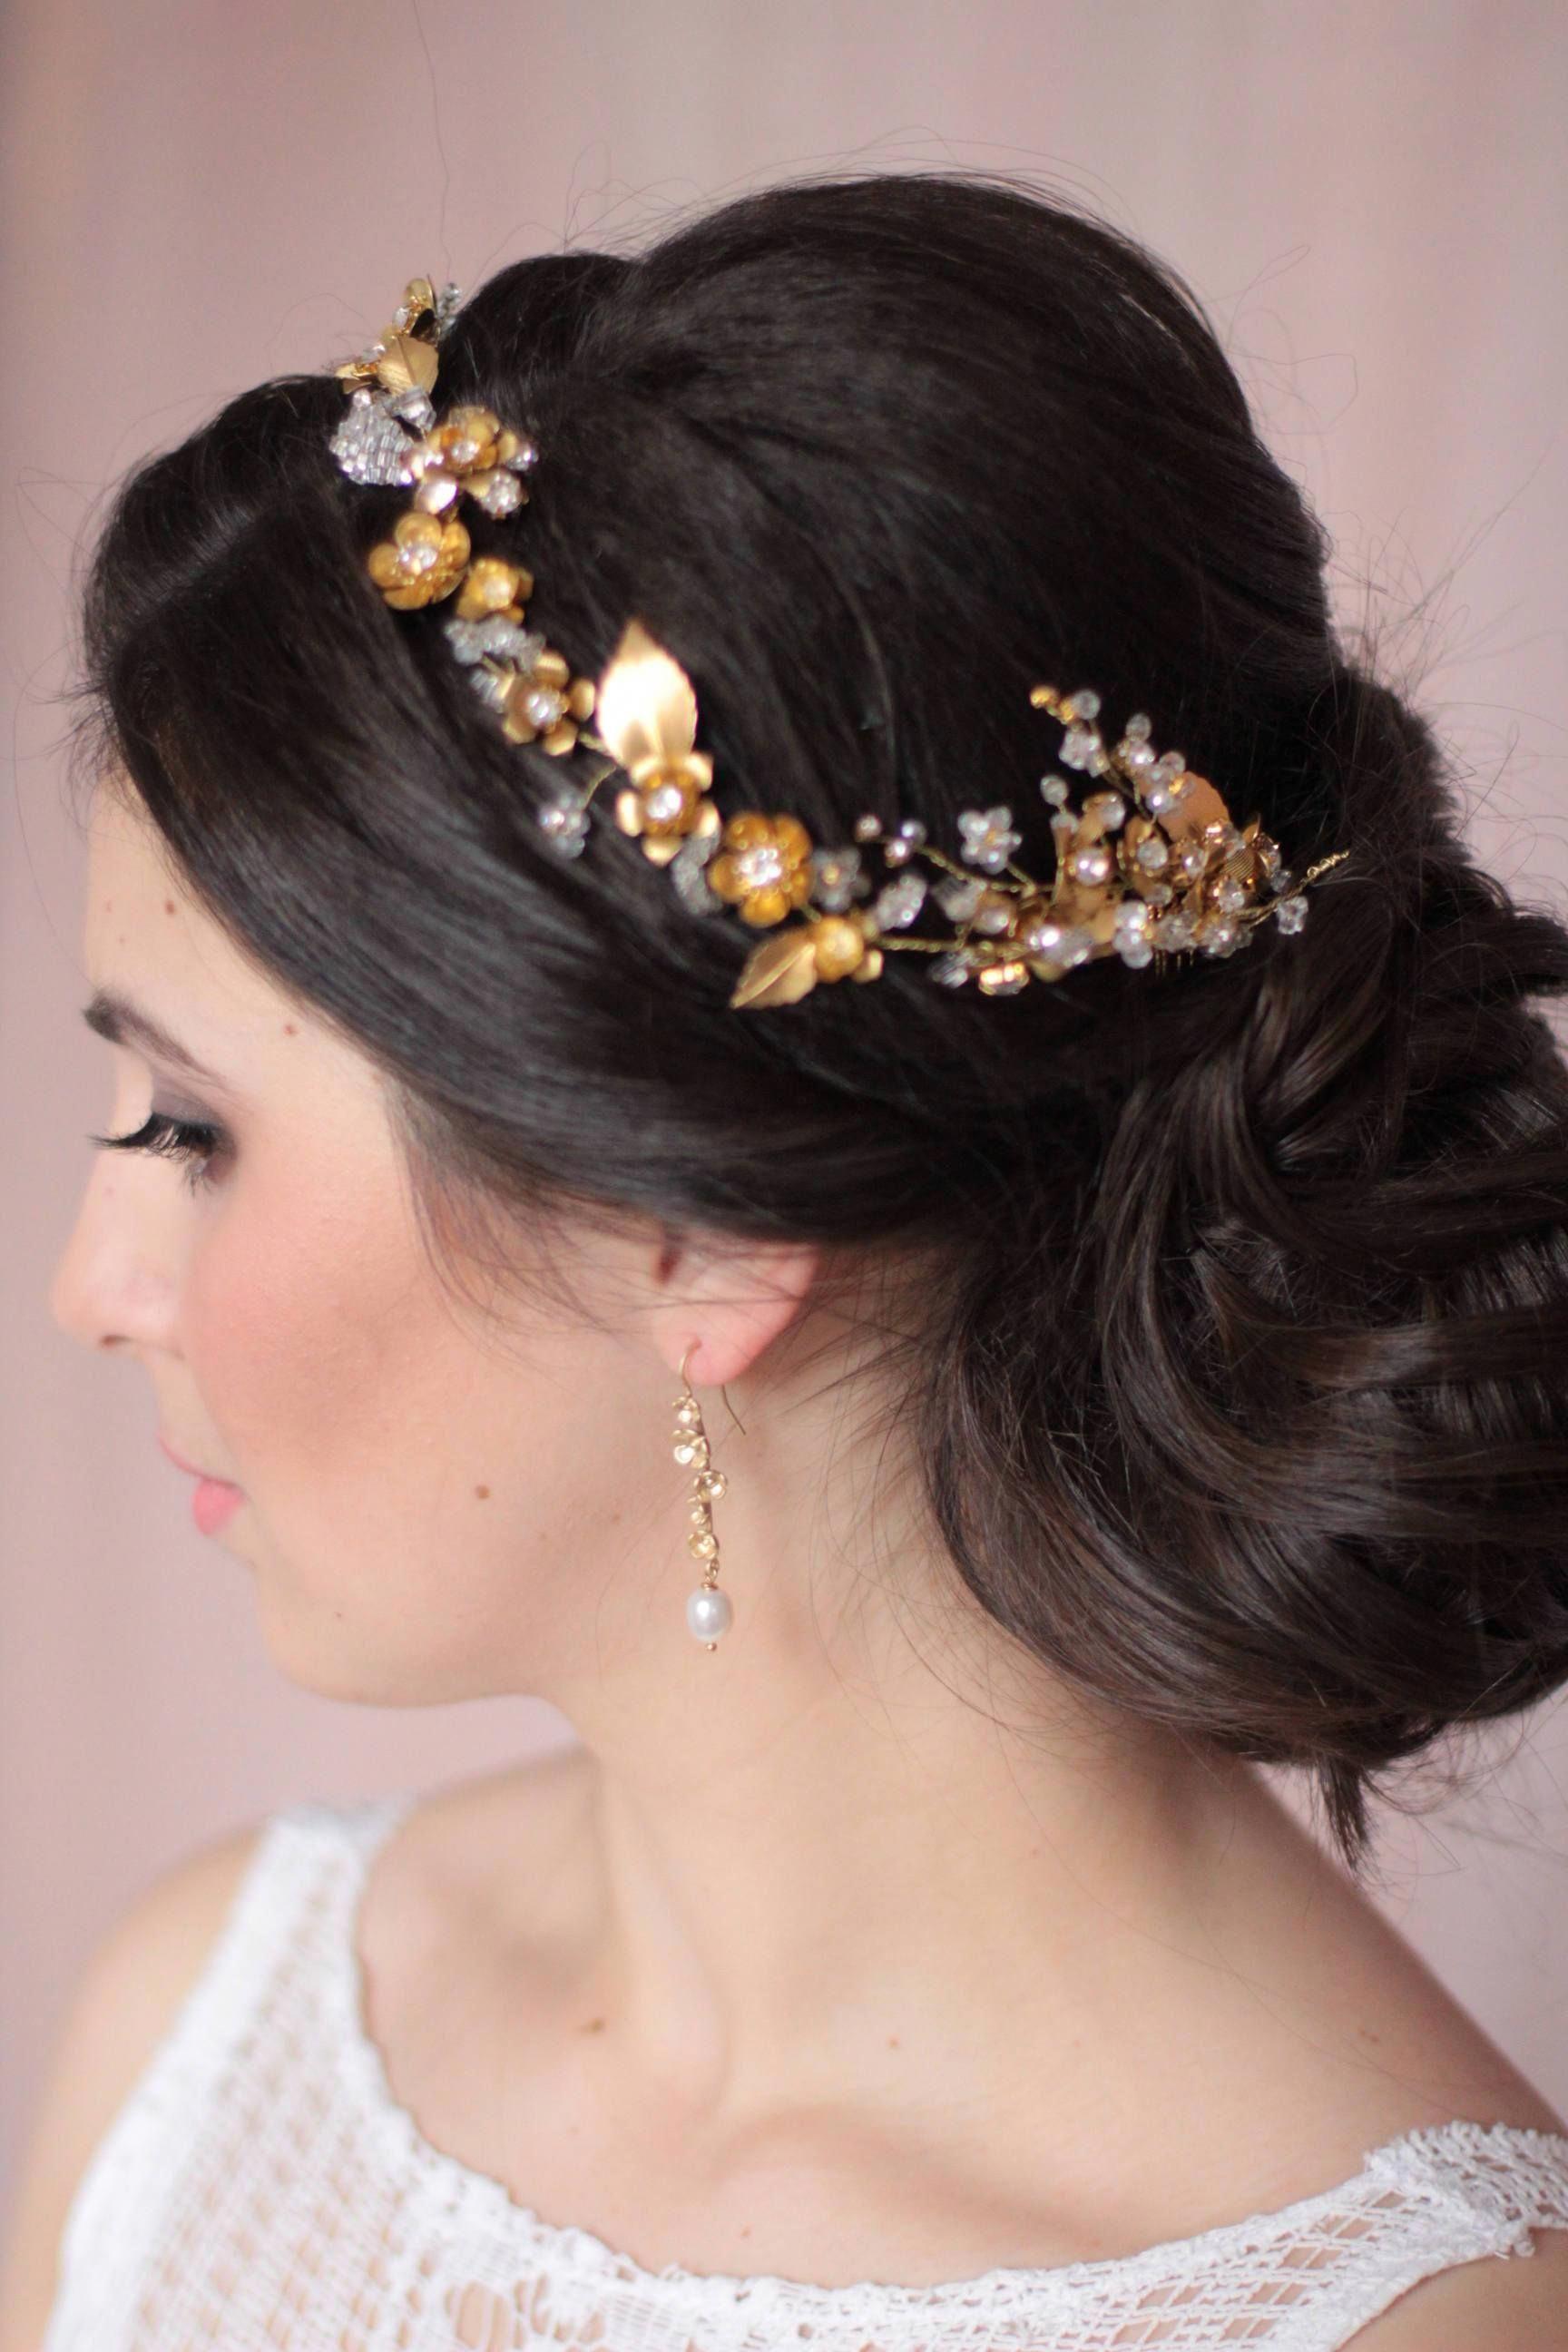 Wedding Jewelry Bridal Floral Earrings Matching Earrings